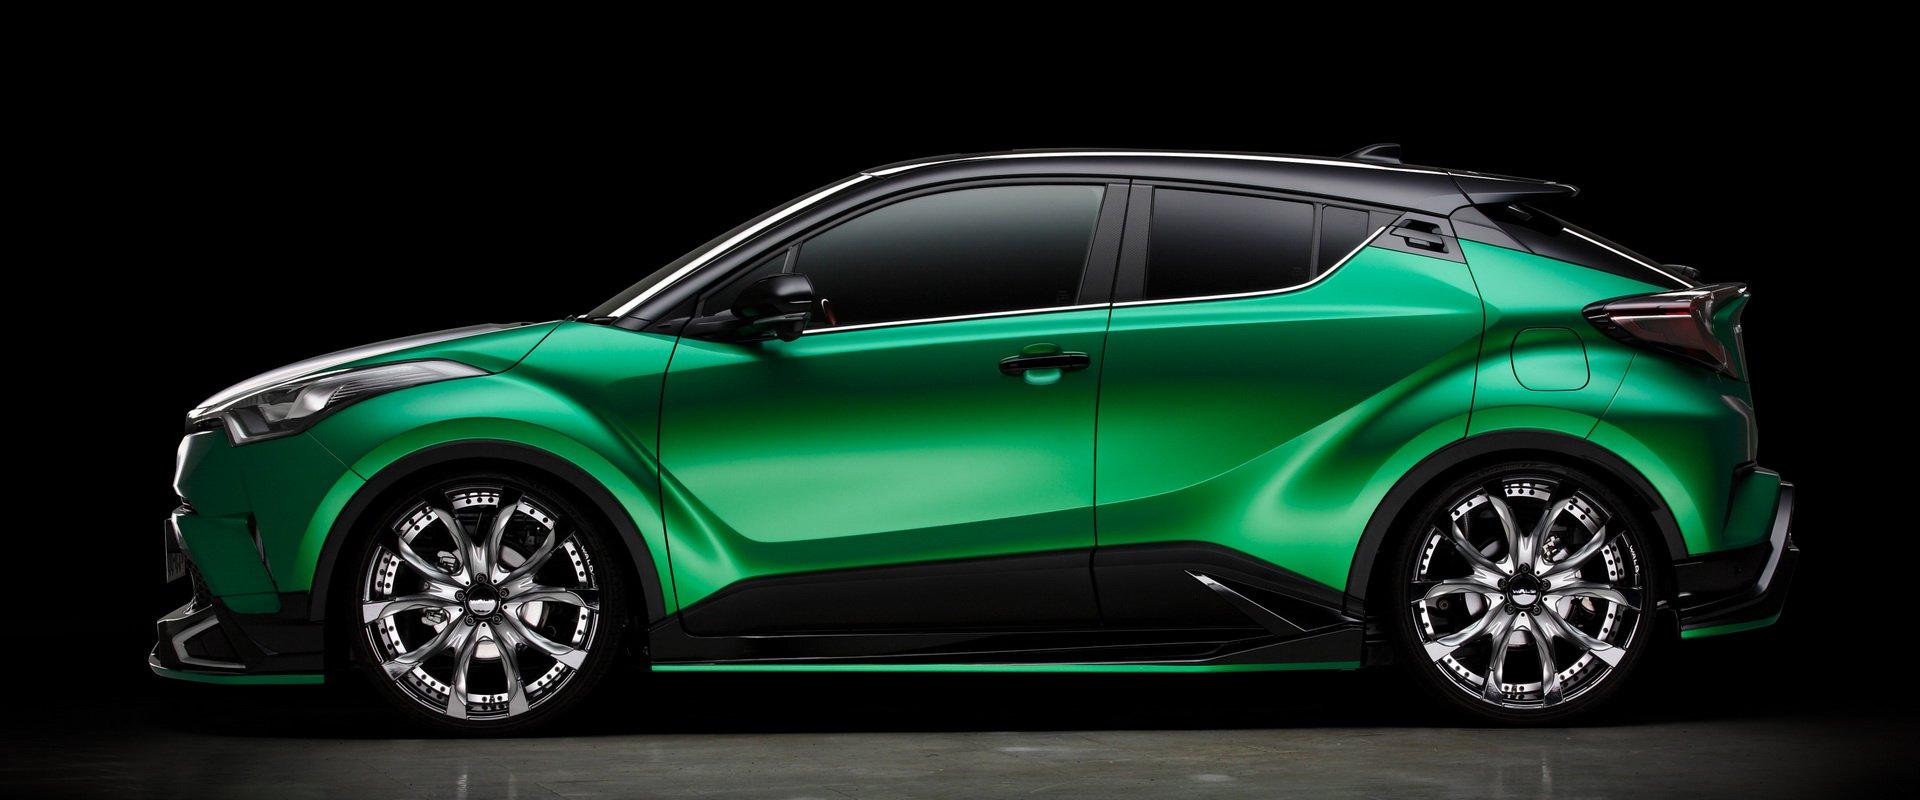 Toyota C-HR by Wald International (33)